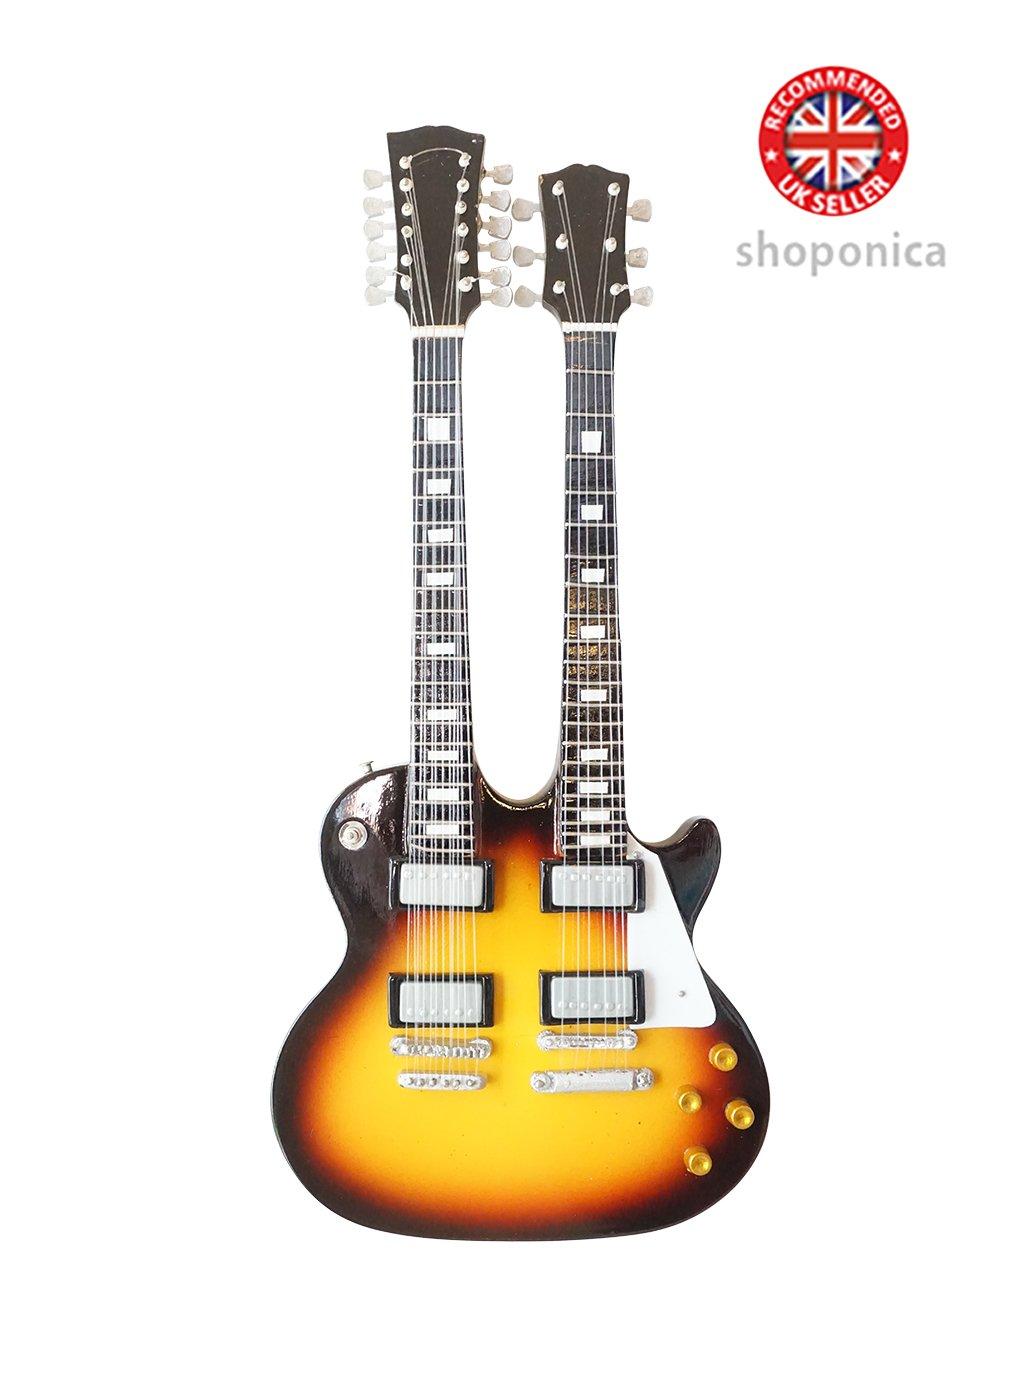 The Eagles Don Felder-Doppel-Hals aus Holz Miniatur-Gitarre Replica Music Legends